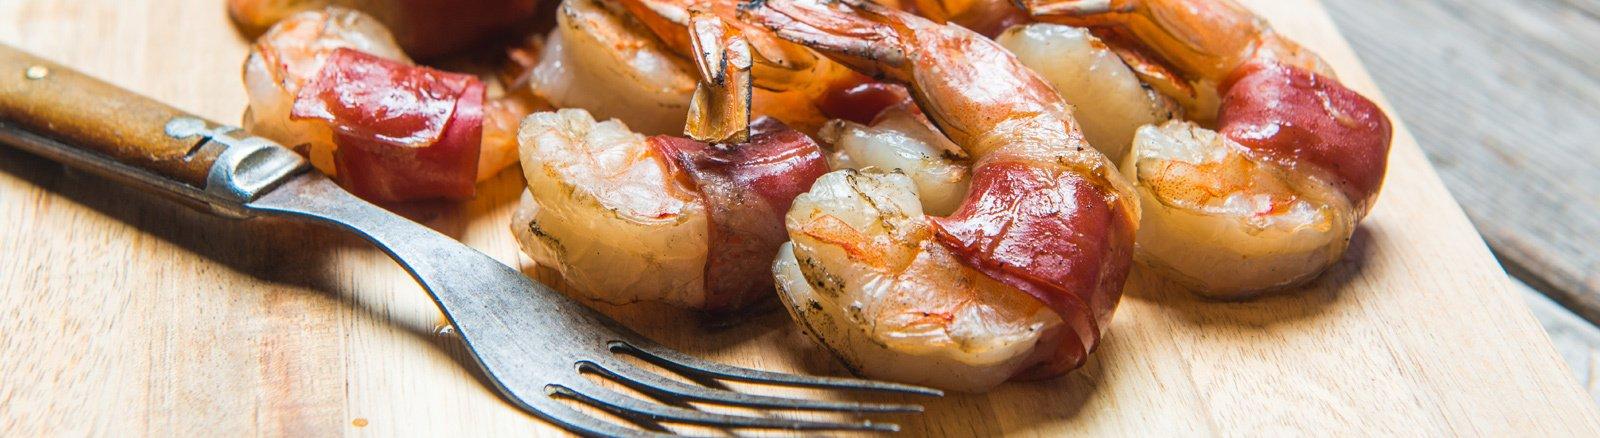 Prosciutto Wrapped Shrimp with Peach Salsa thumbnail